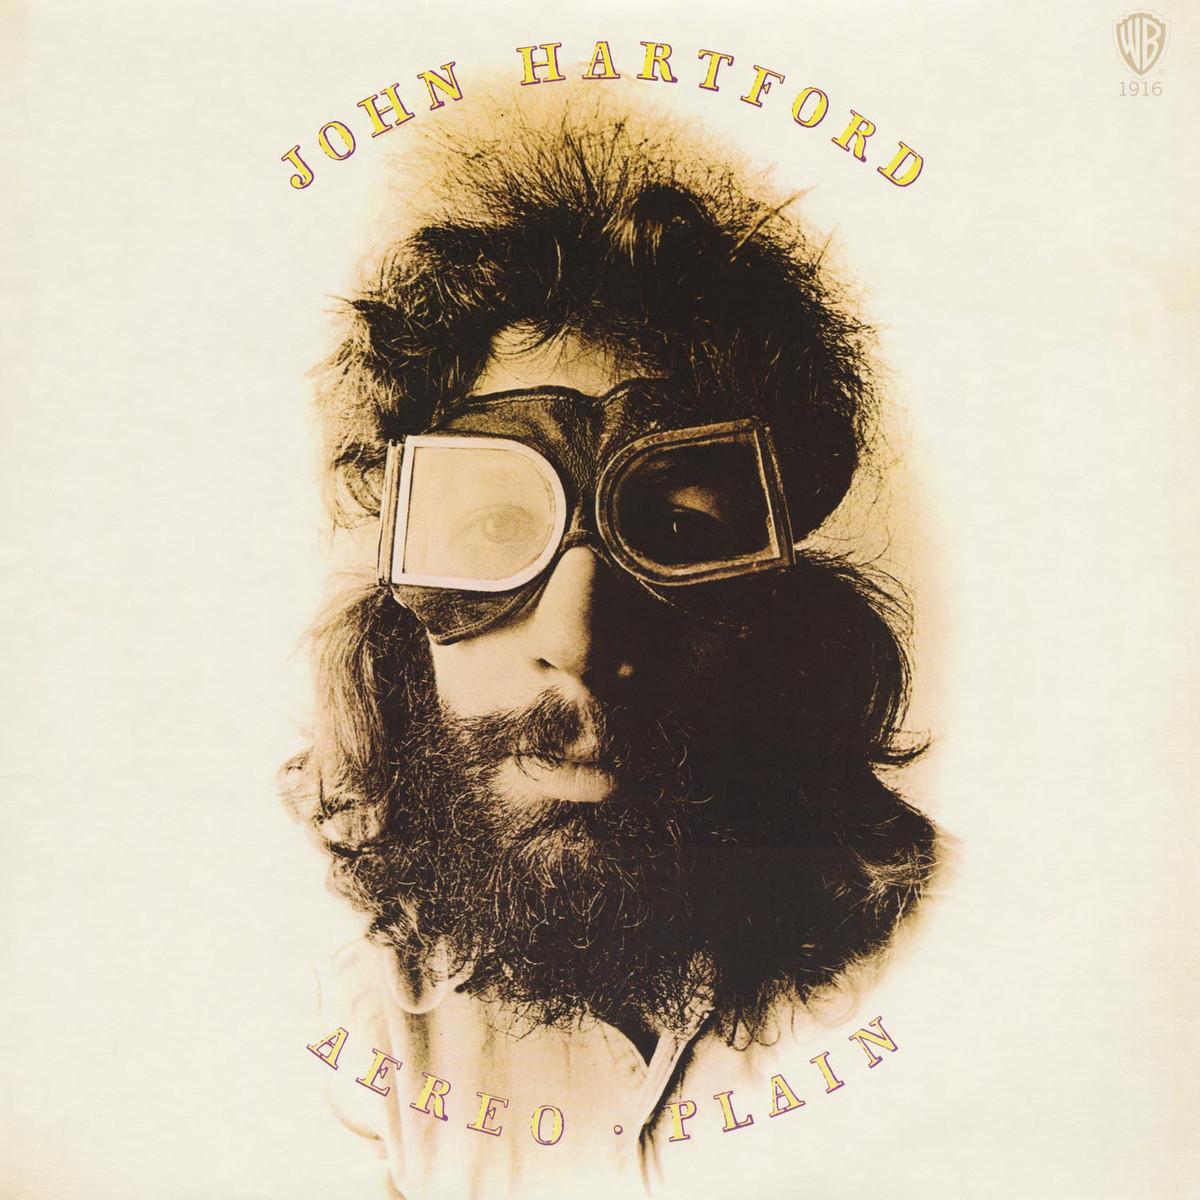 John Hartford Aereo-Plain Album Cover